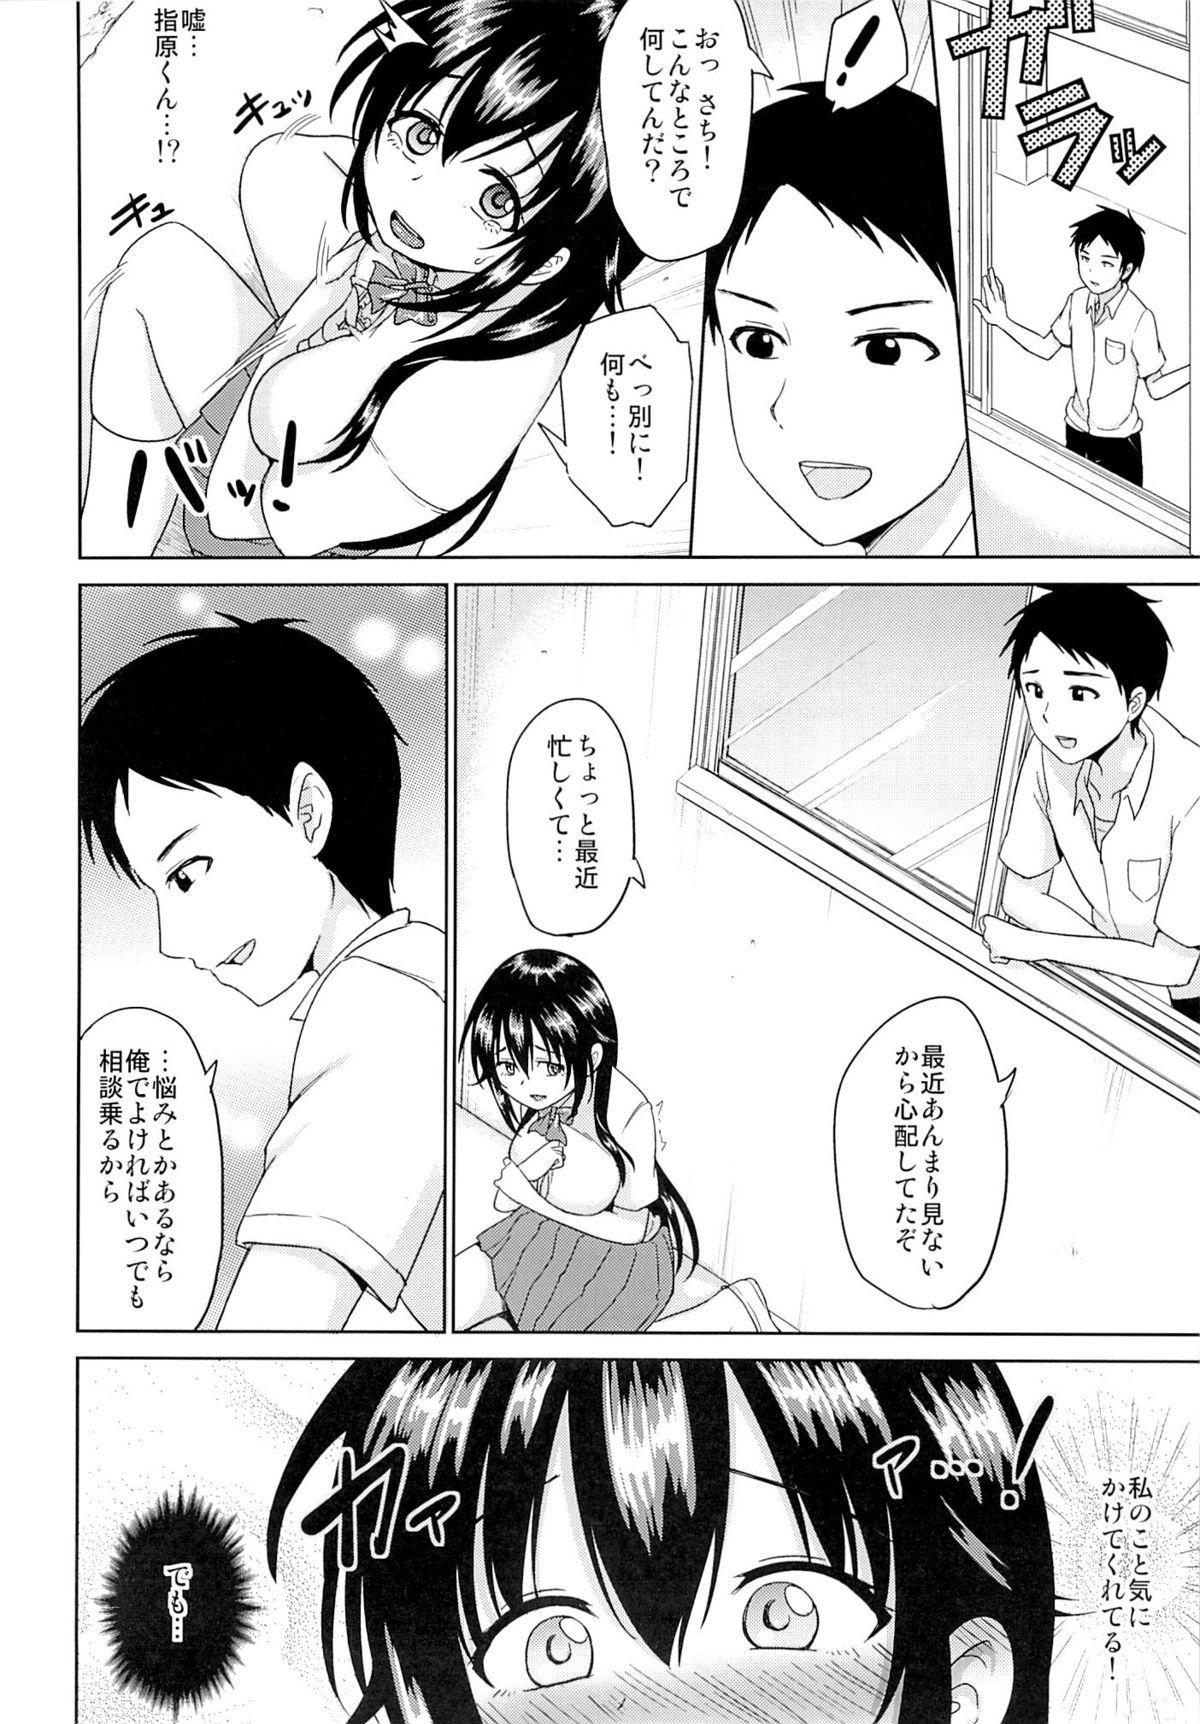 Sachi-chan no Arbeit 3 10